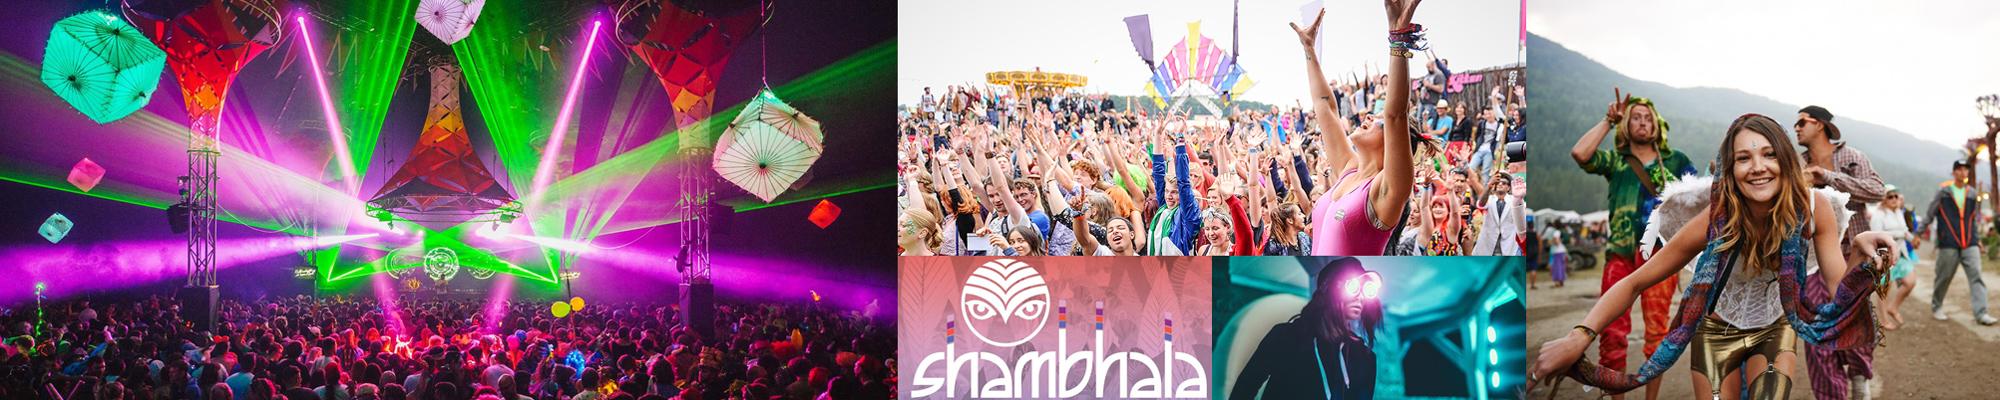 Festival musicali Canada: Shambala Music Festival